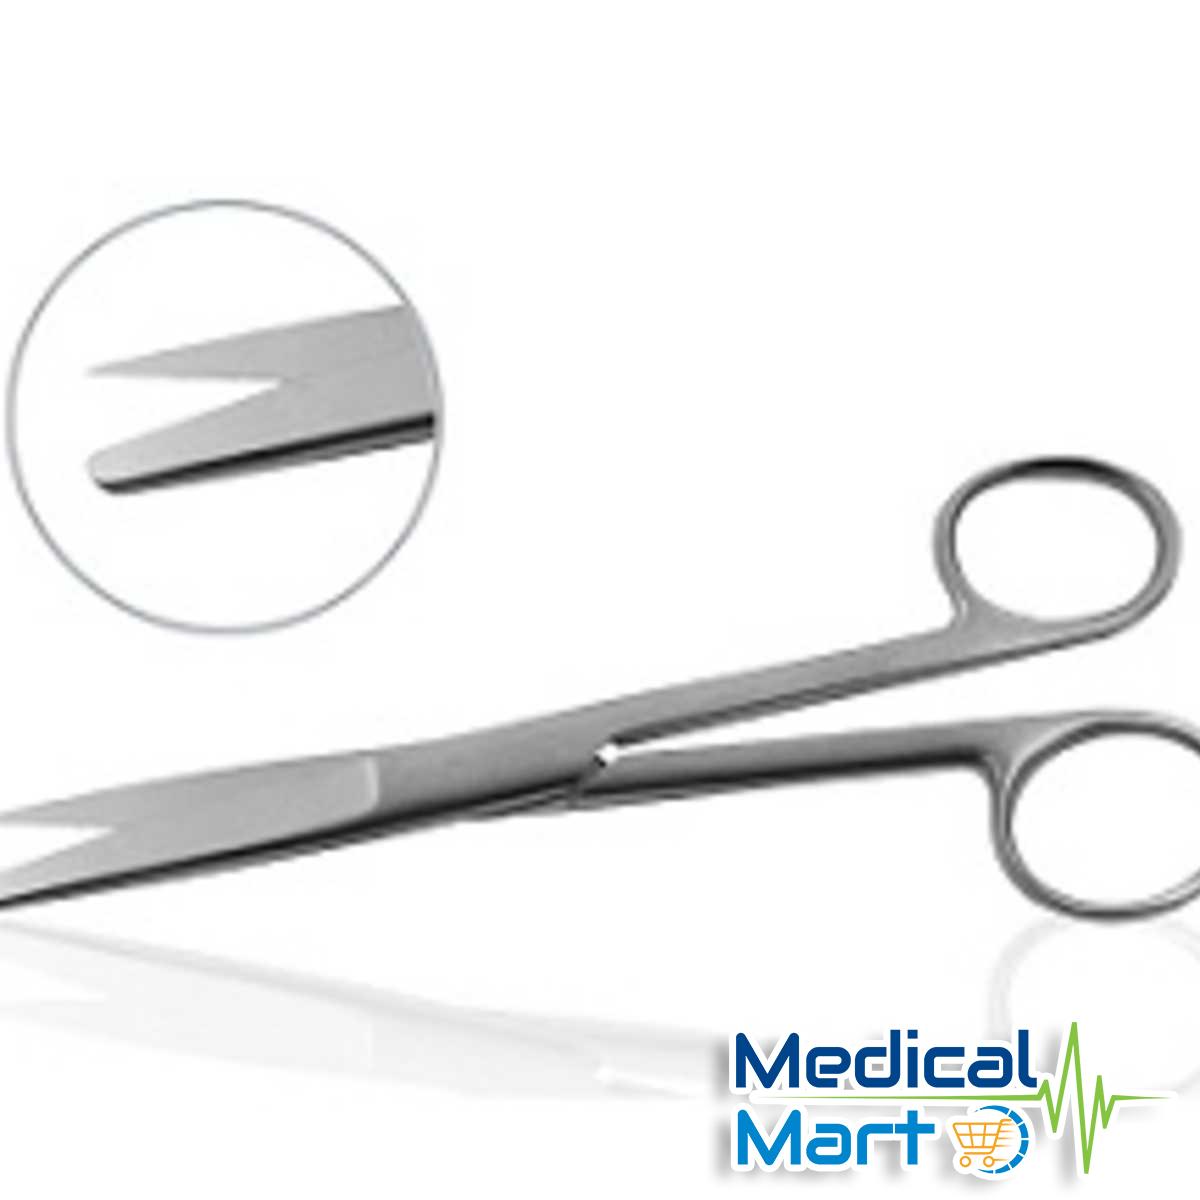 Operating Scissors Sharp/Blunt, Straight 5.5 Inch